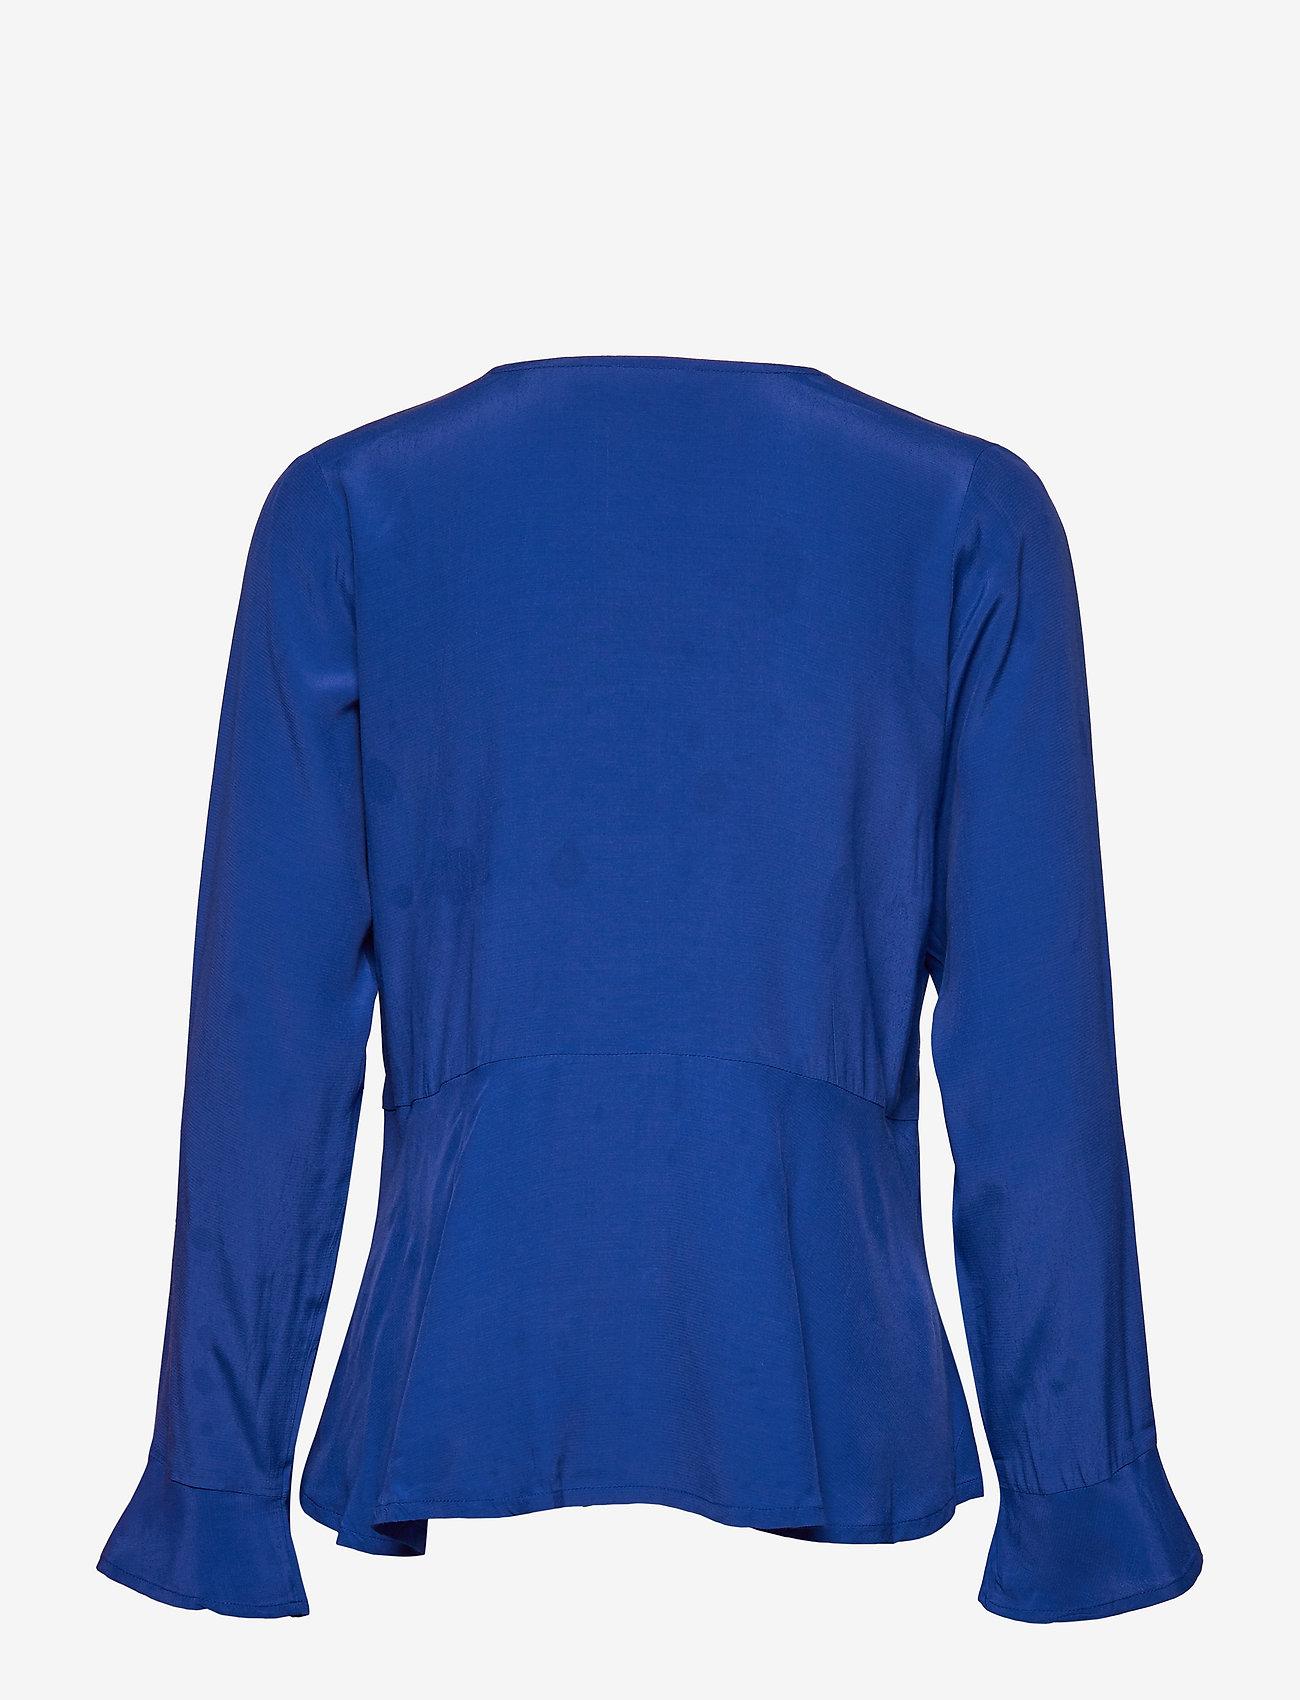 Masai - Irita blouse - bluzki z długimi rękawami - royal blue - 1